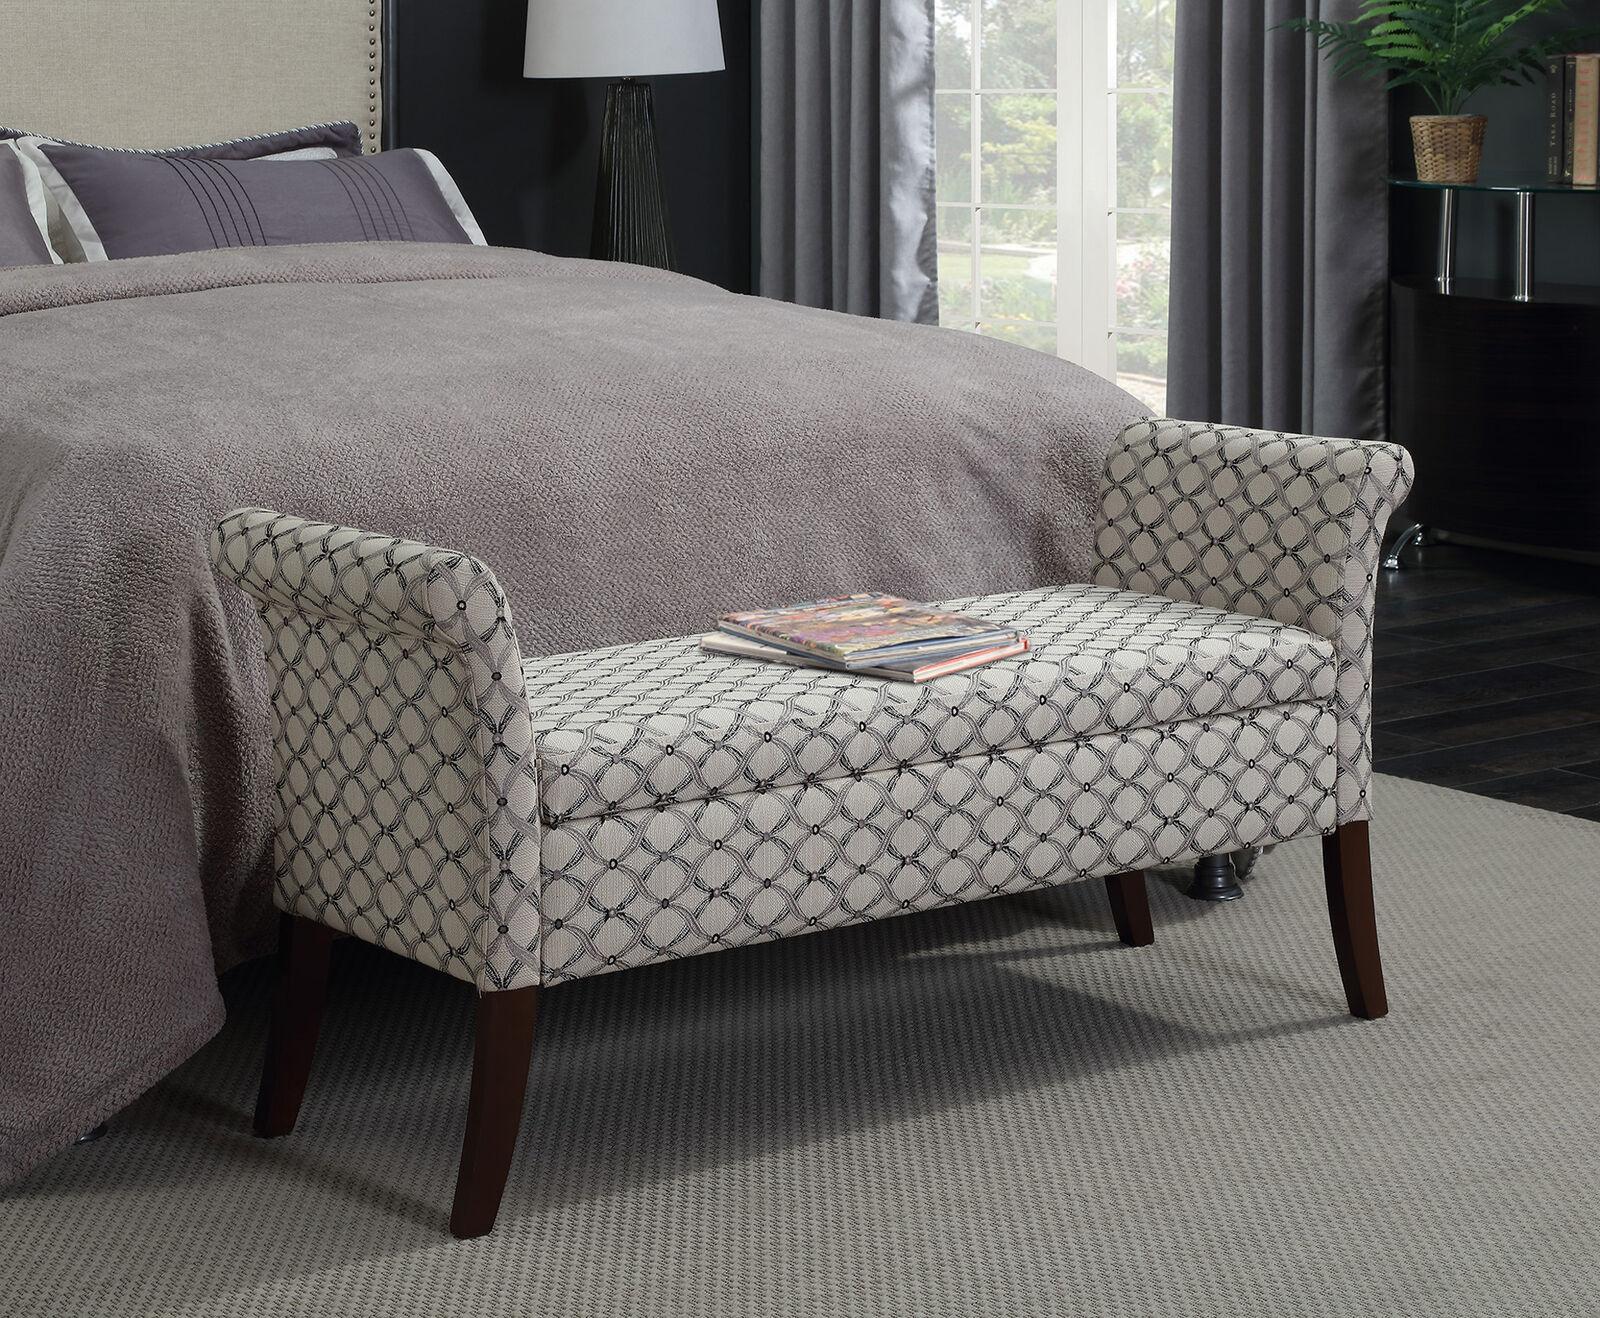 Bedroom Storage Bench Ottoman Seat Fabric Sofa Hallway Living Room Furniture New Ebay